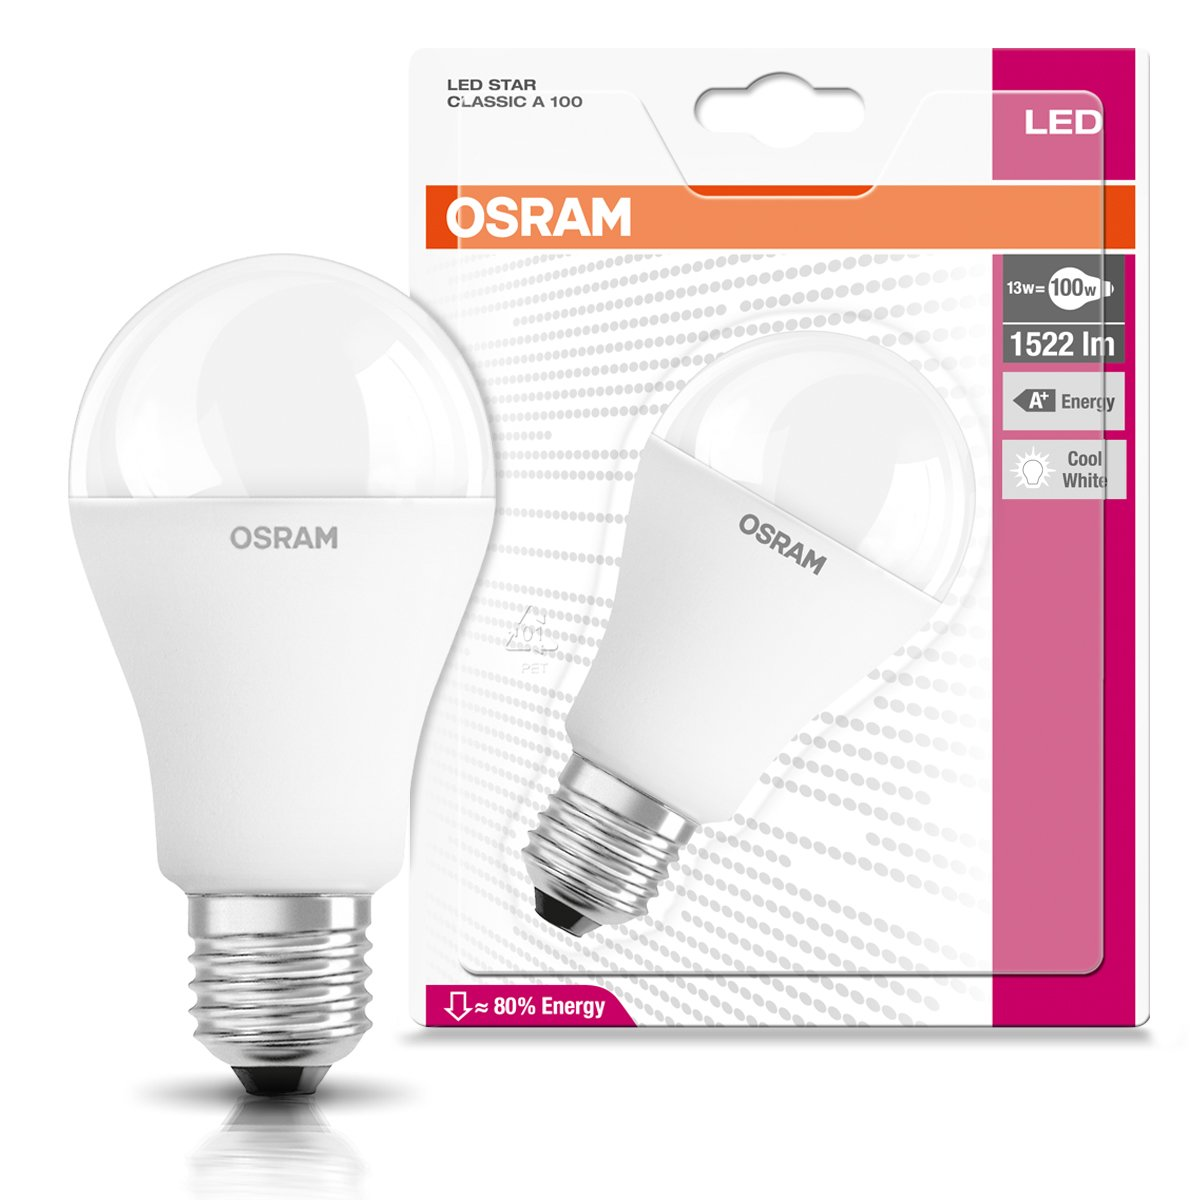 Osram Star Classic a 100 CW E27 BLI Lampada LED, Standard, 13 Watt, Bianco Freddo